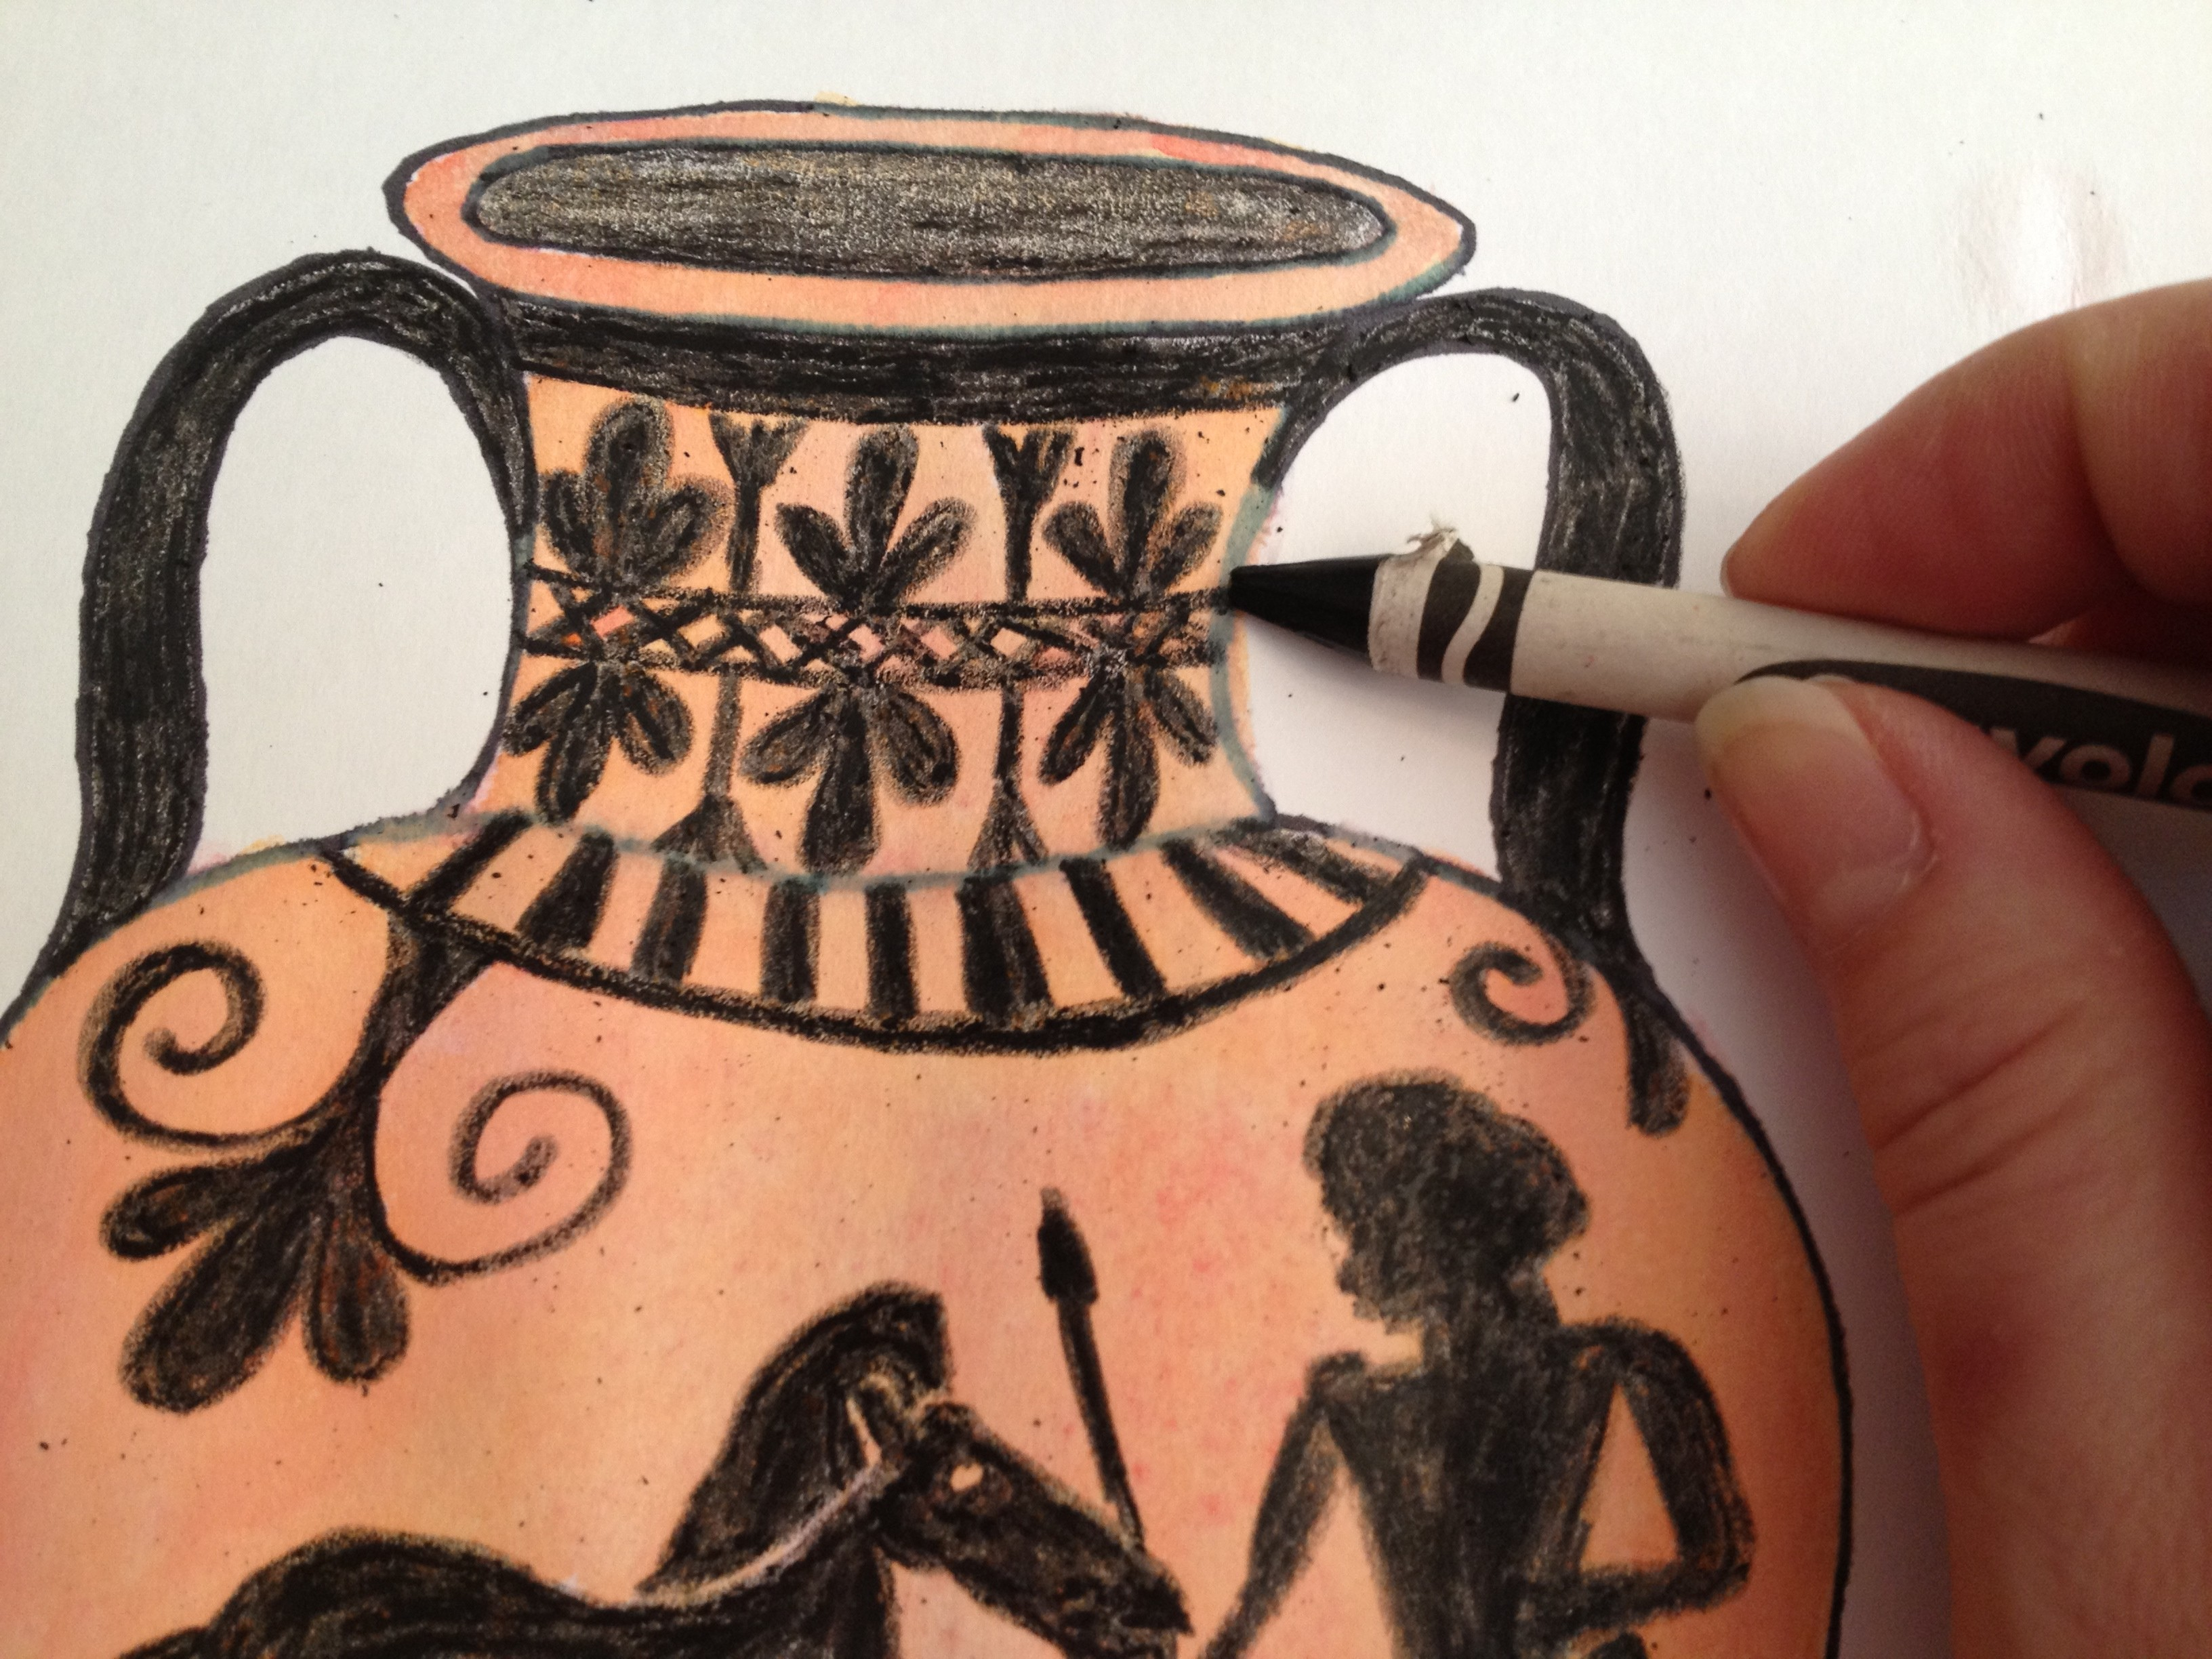 Drawn vase greek pottery Up The Nest Vases! Swan's